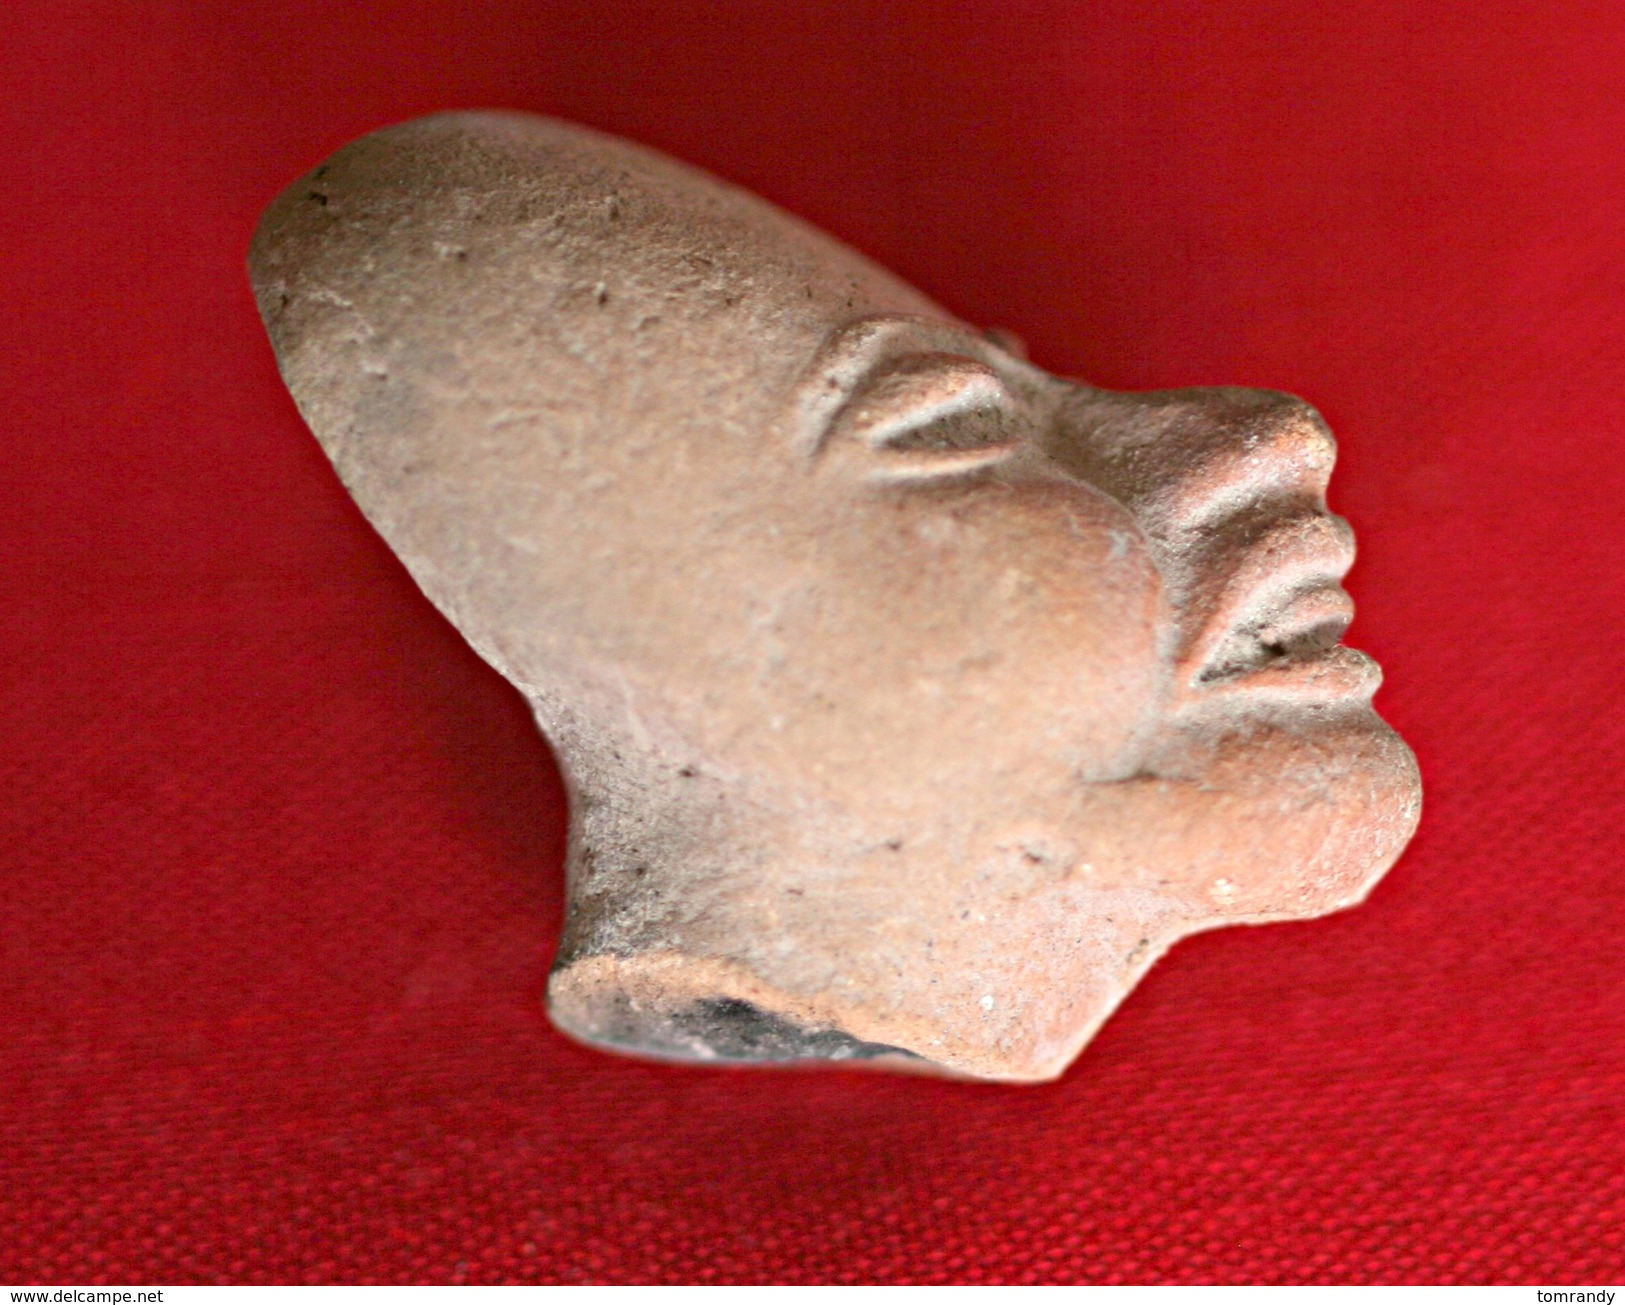 Prä-historischer Maya-Kopf Aus Mexiko - Archäologie